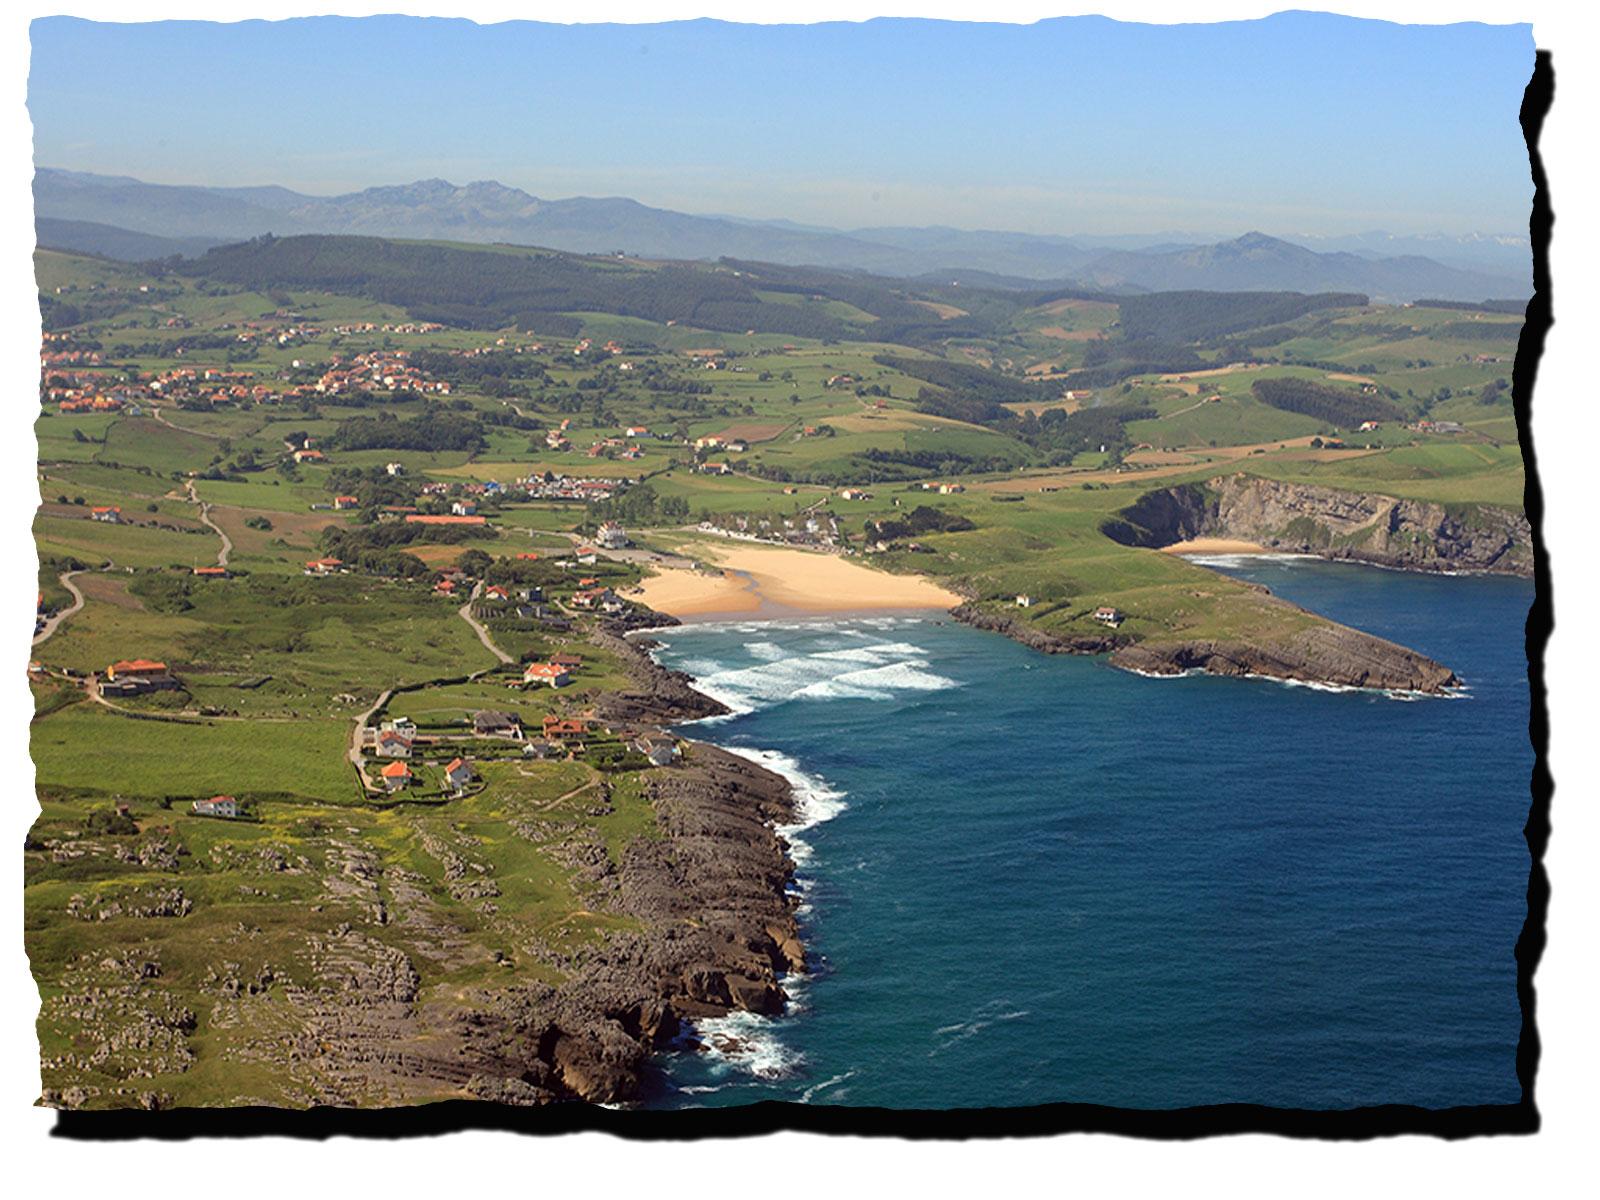 Vista aérea playa cuberris